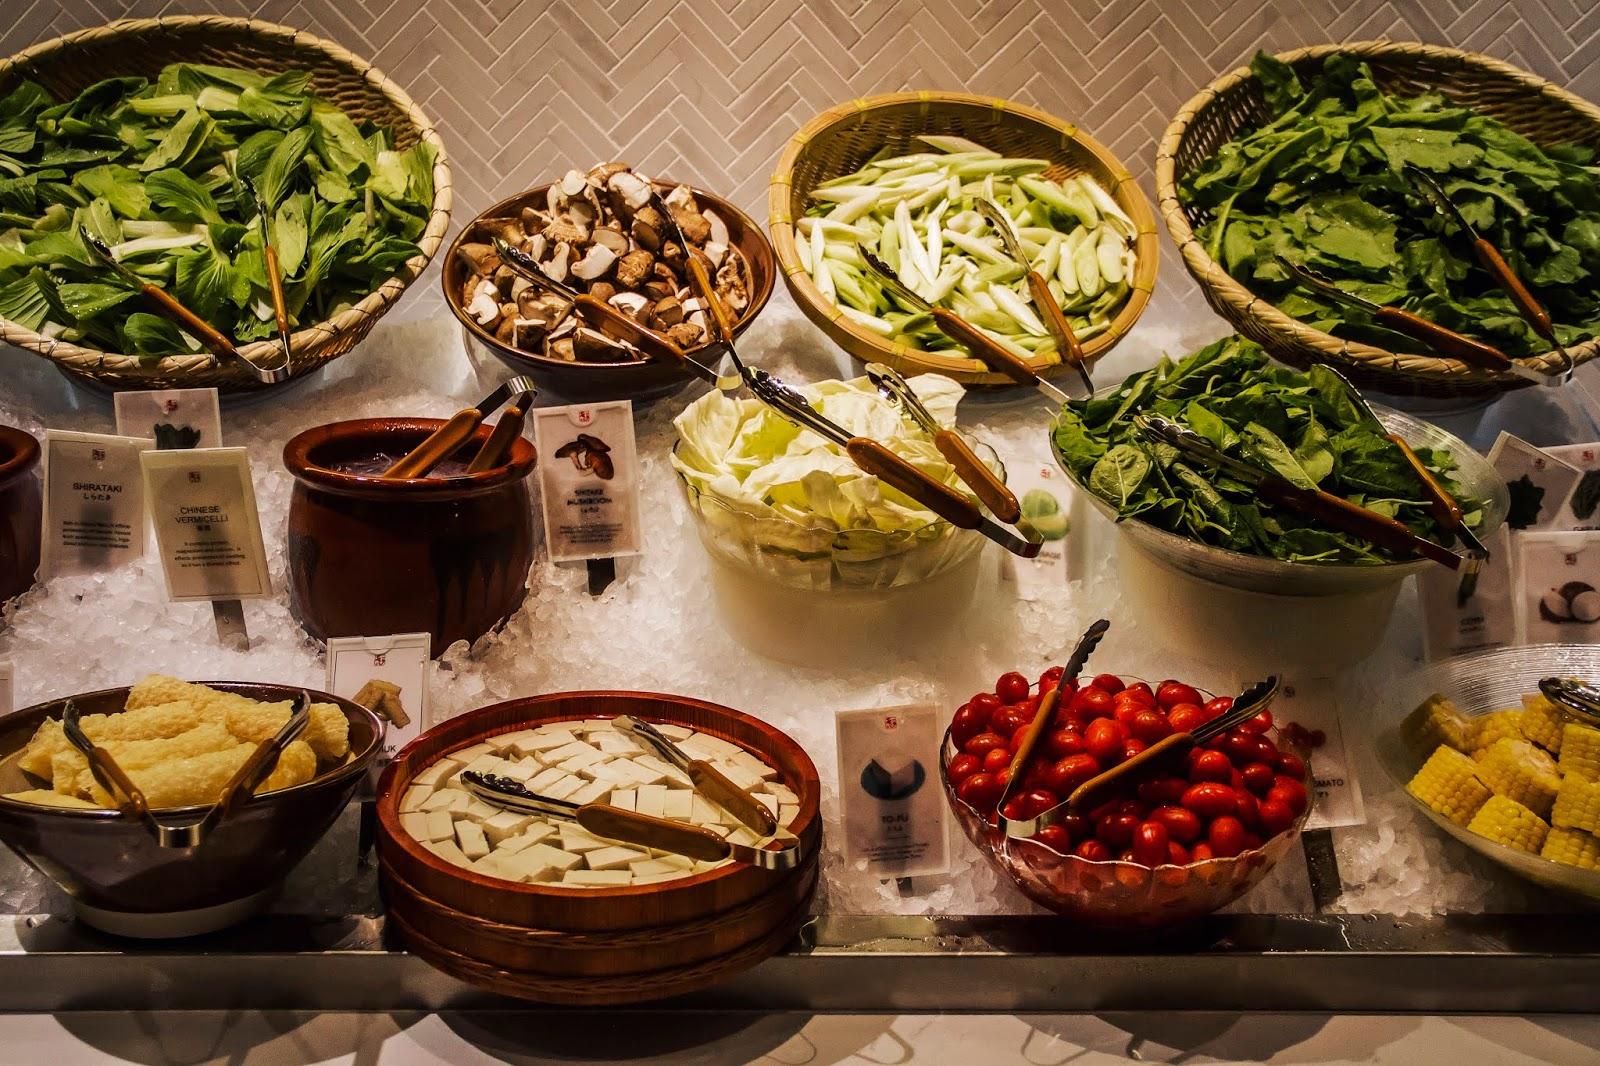 Follow Me To Eat La - Malaysian Food Blog: MO-MO Paradise ...